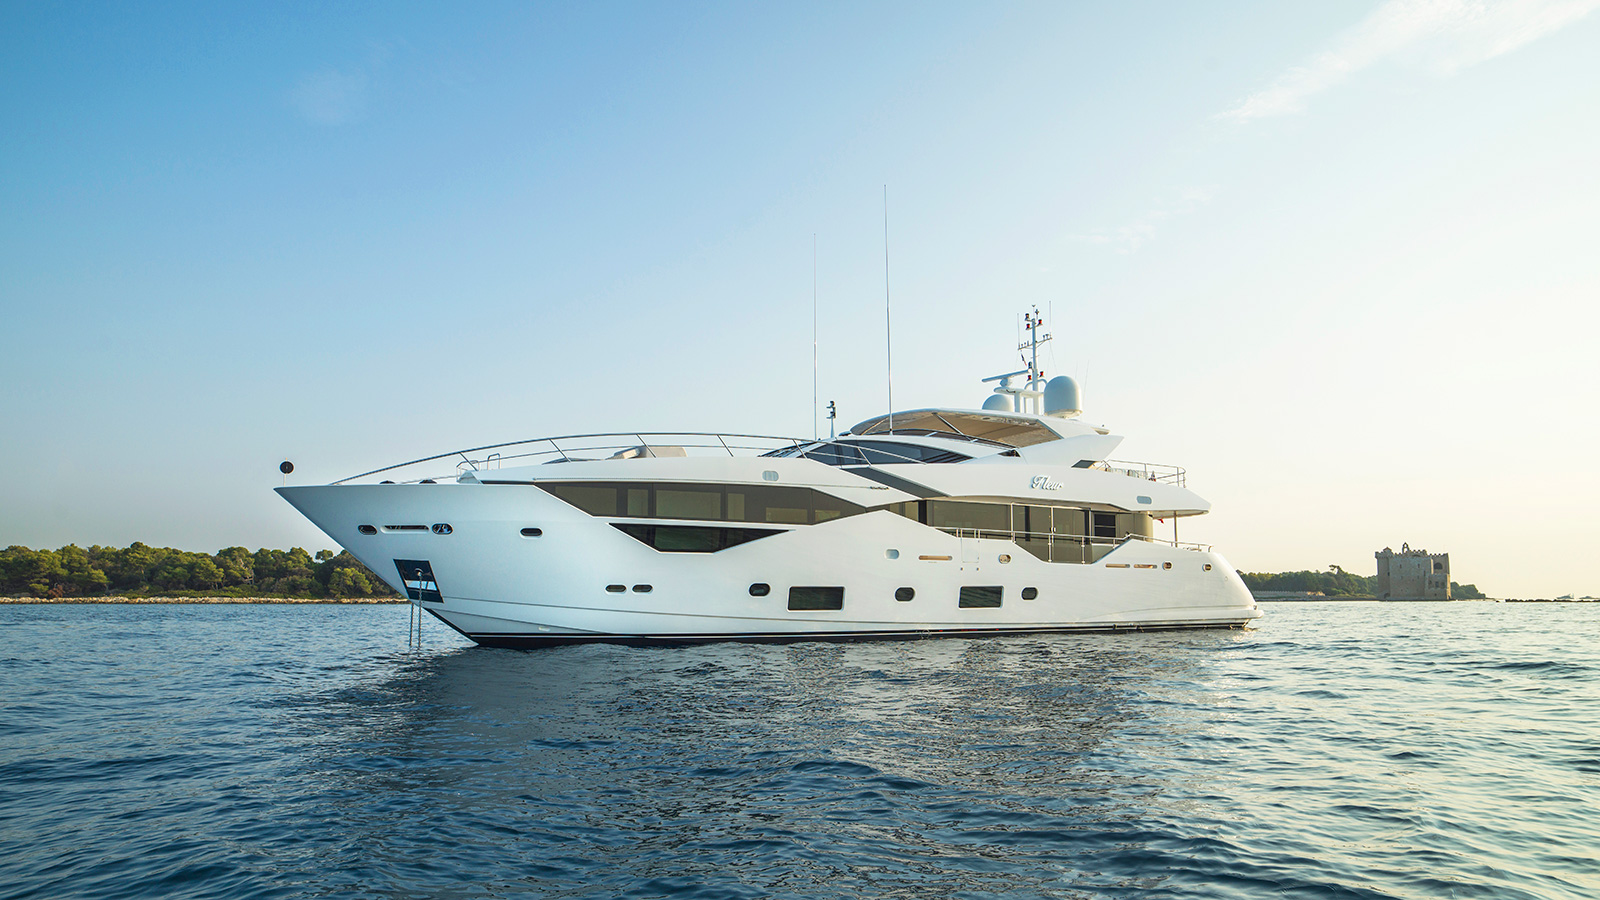 side-view-of-the-sunseeker-116-yacht-fleur-credit-mike-jones-waterline-media